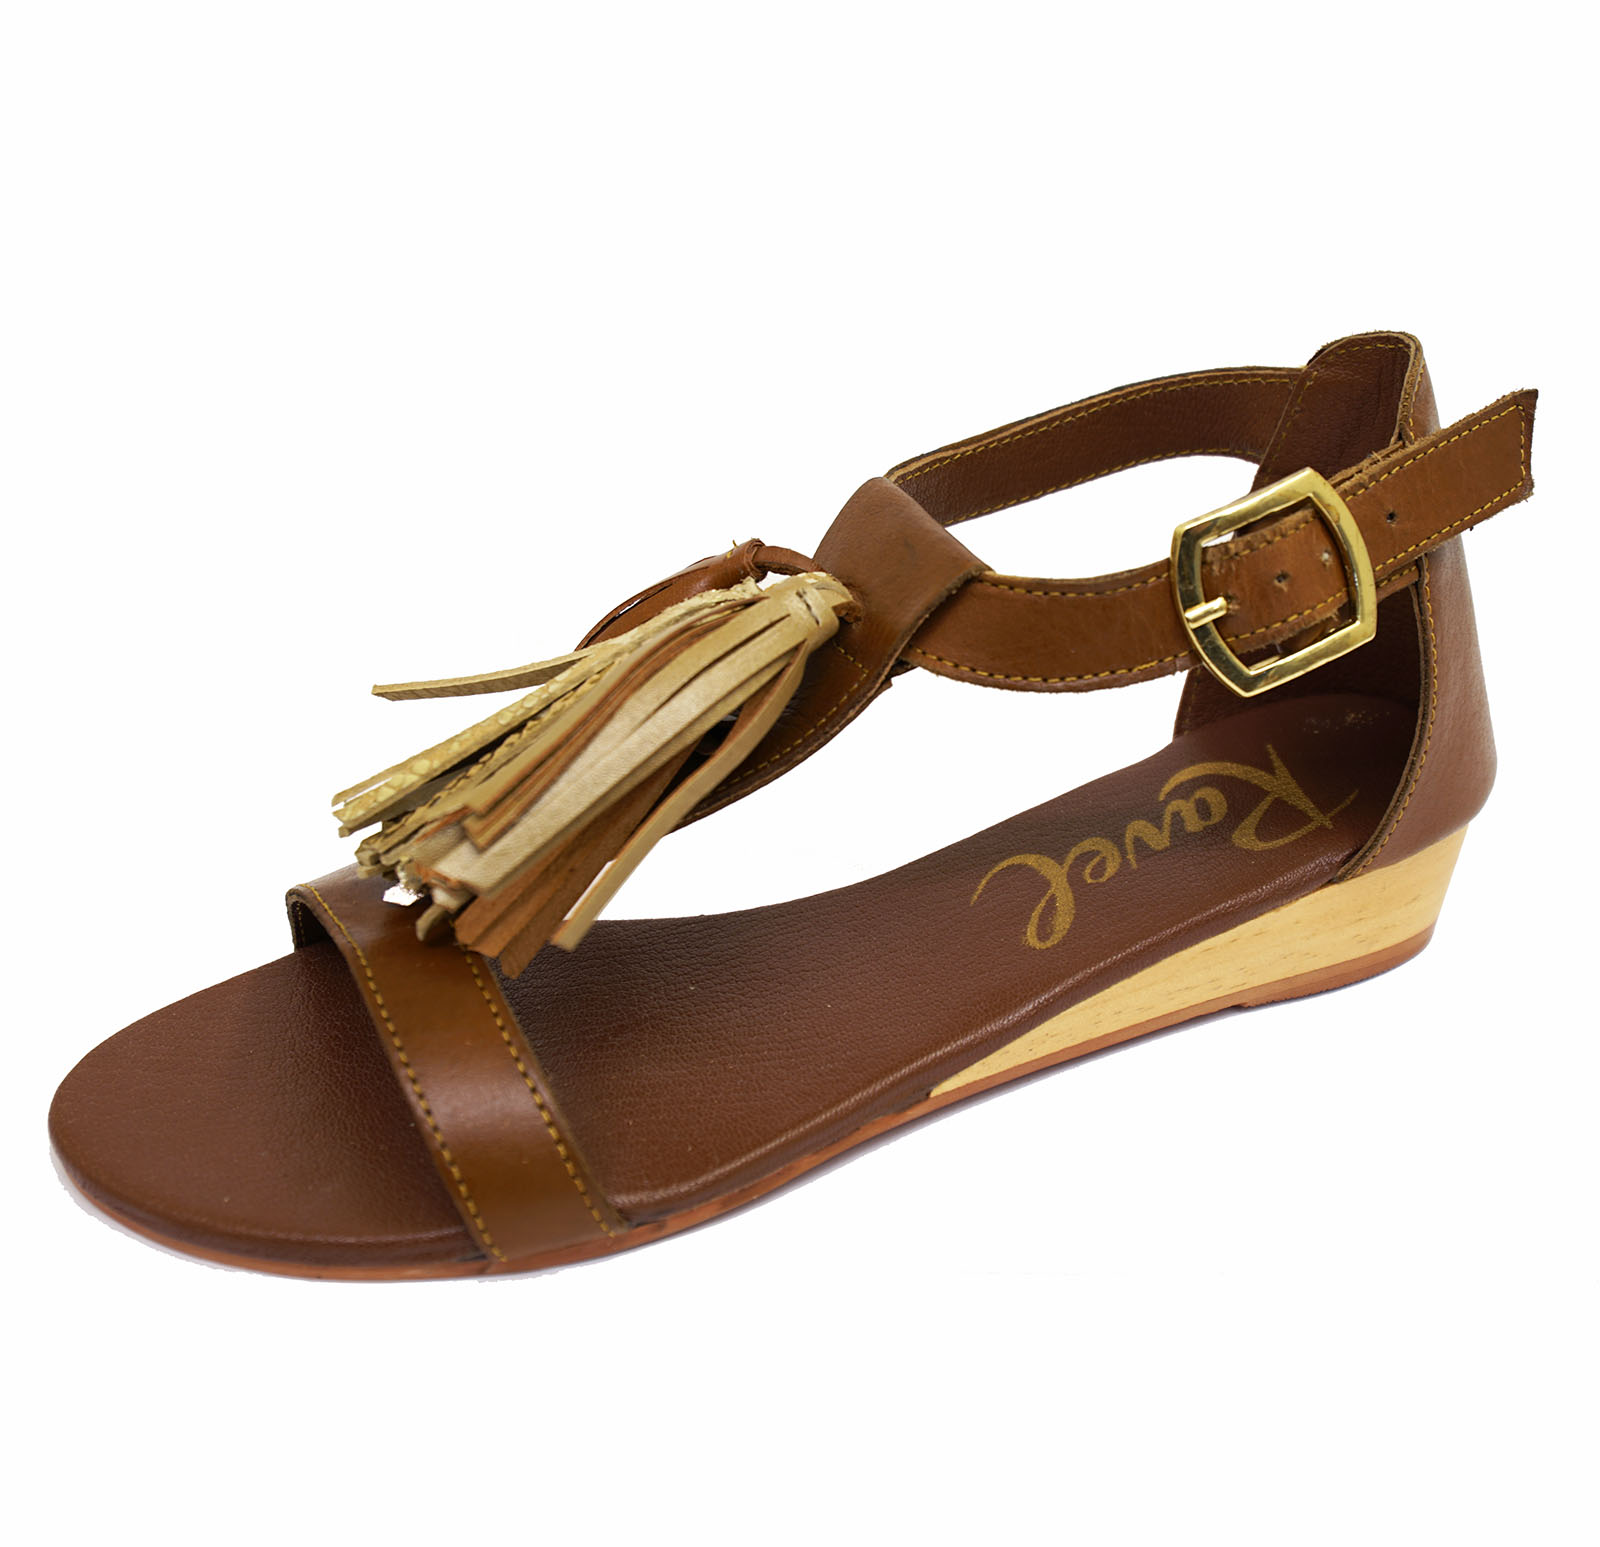 Donna Ravel ASTORIA basse pelle marrone sandali da infilare con Cinturino Scarpe